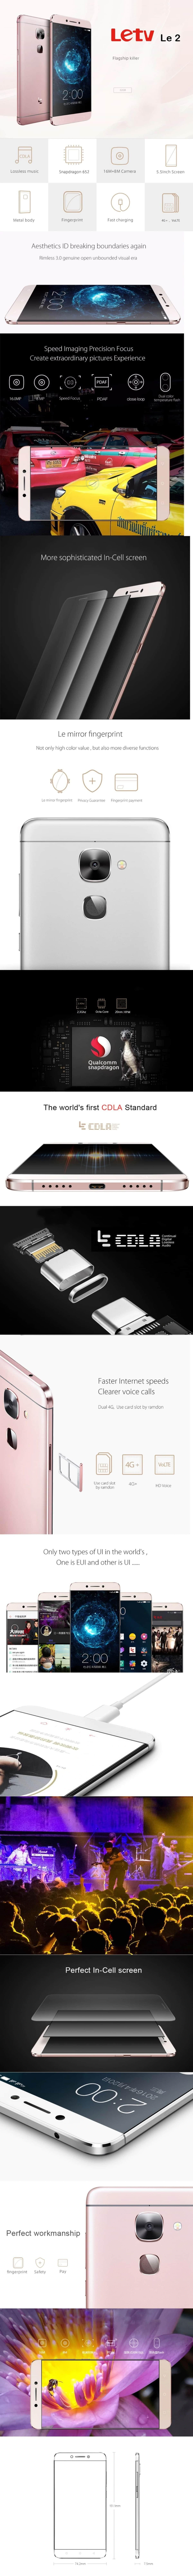 LETV-LeEco-LE-2-X520c23807e2a8d2bede.jpg